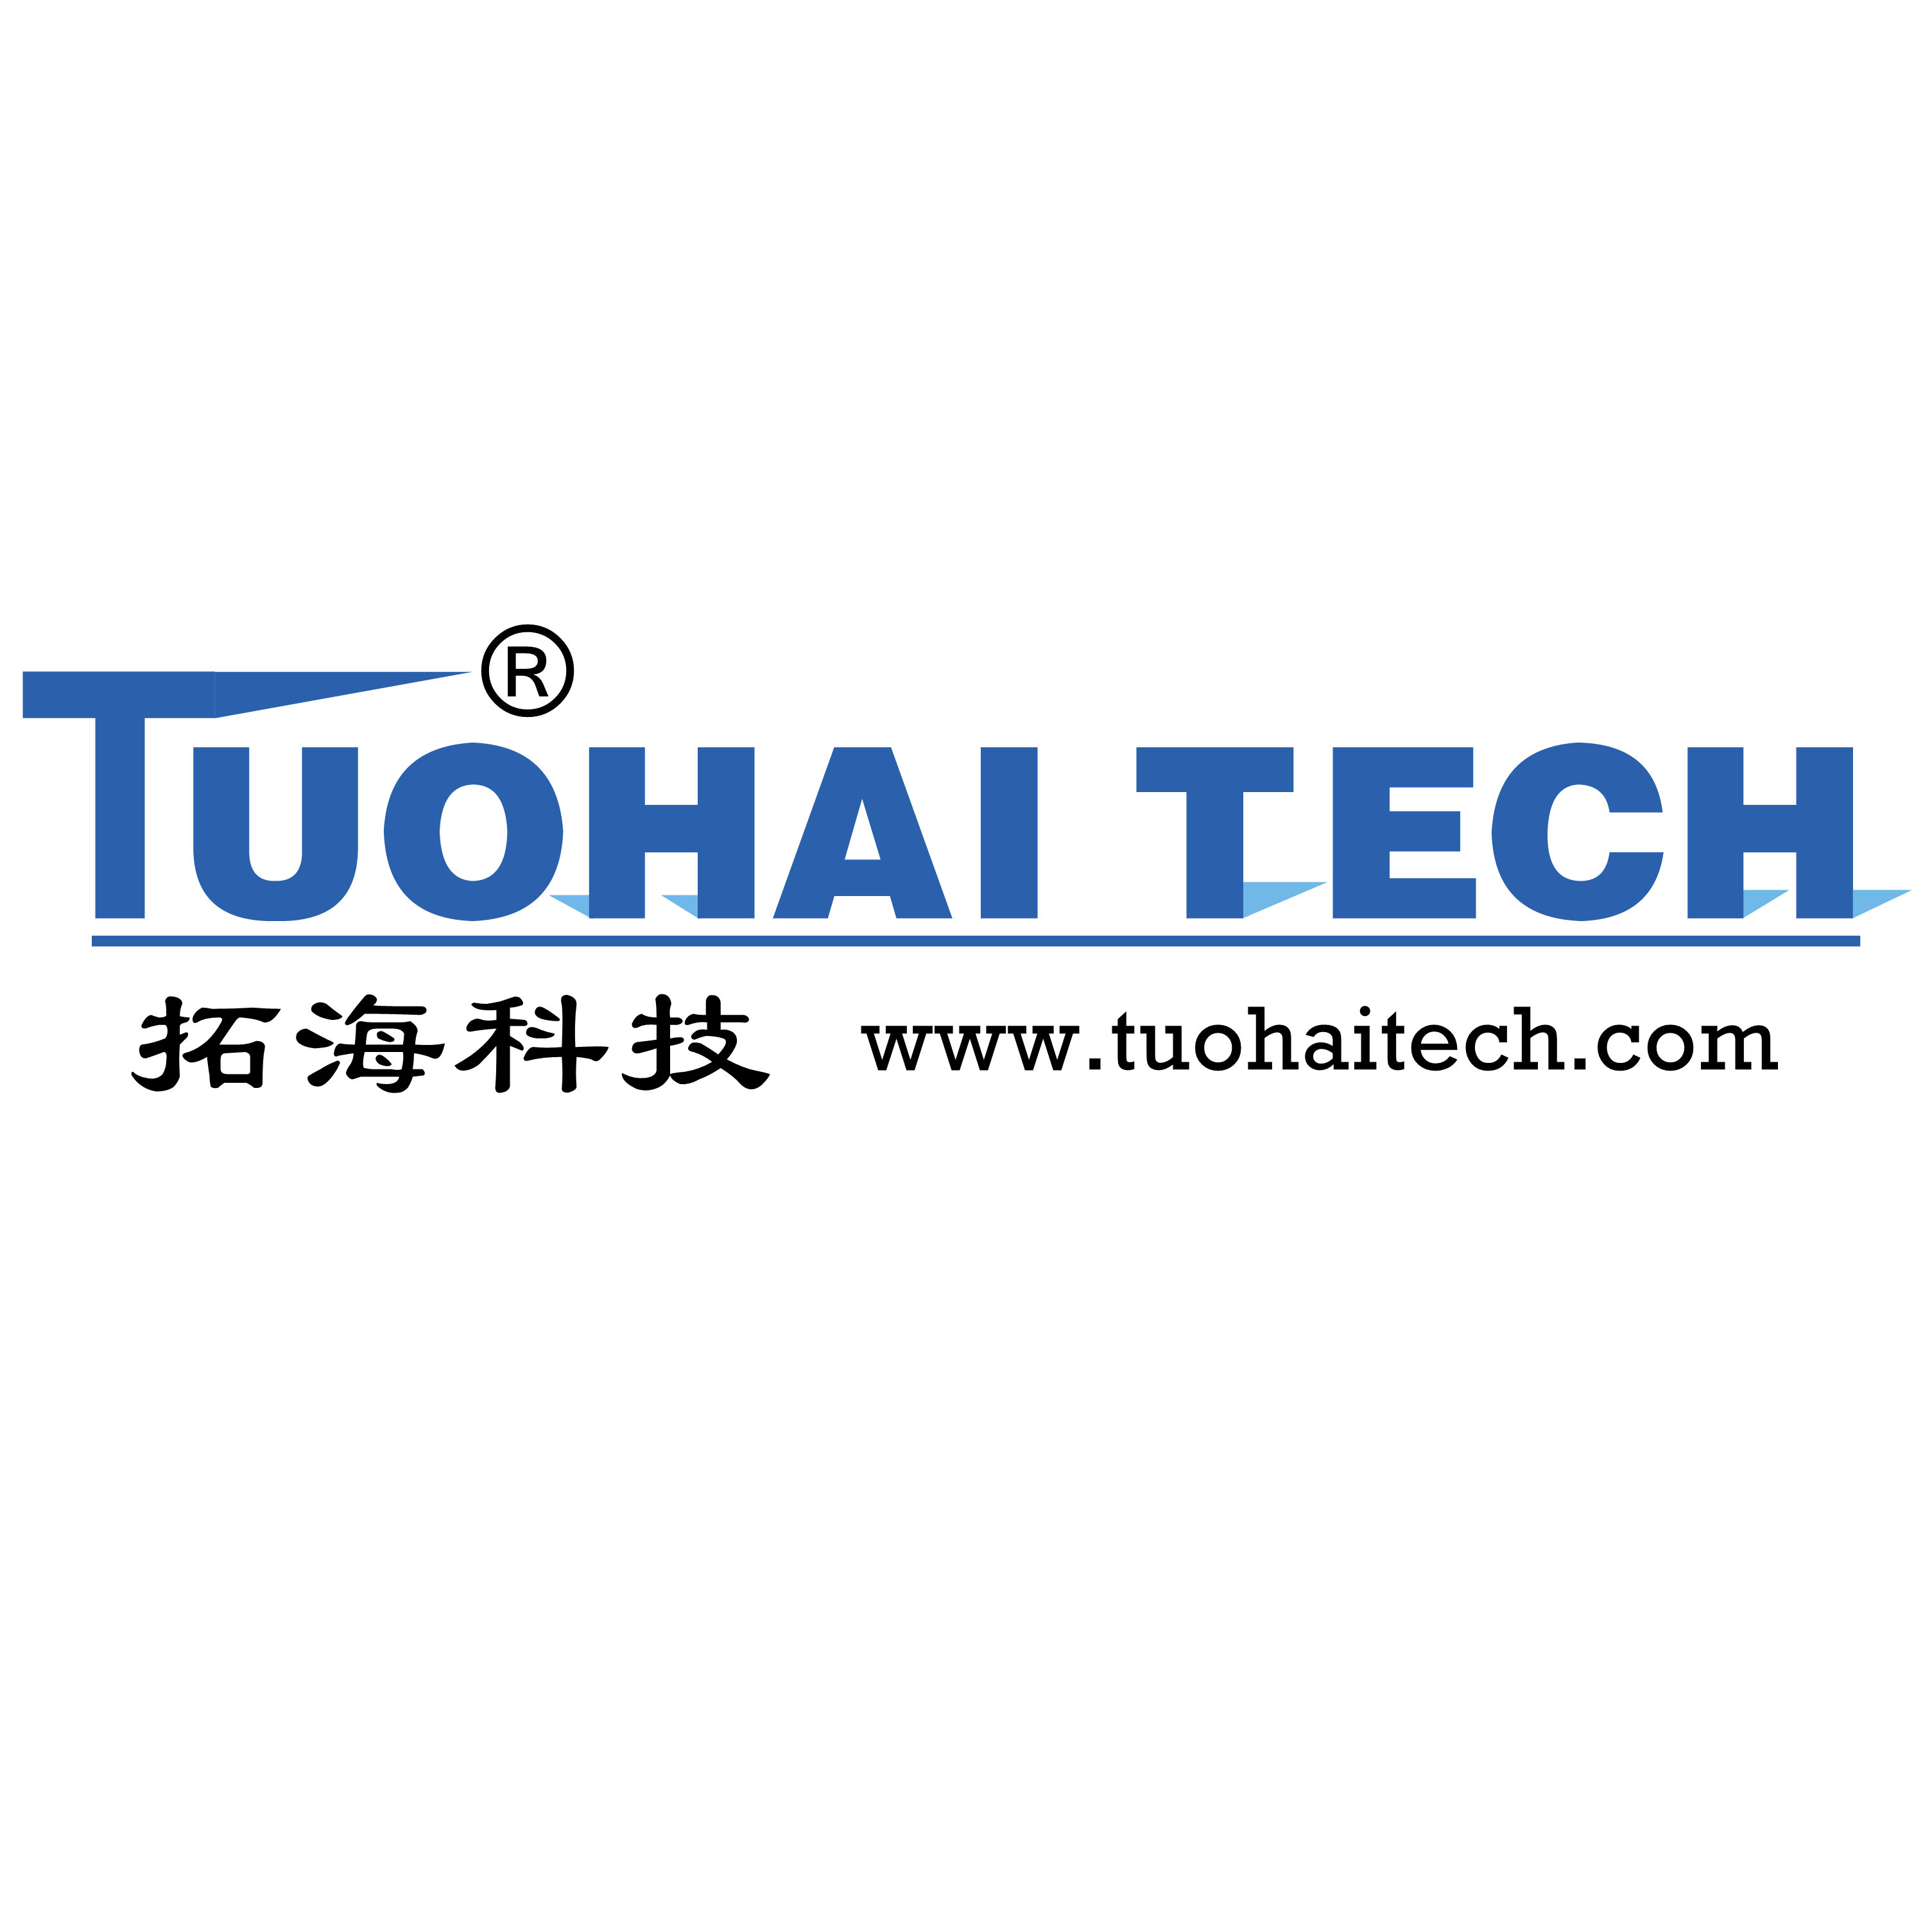 Tuohai Technology Co., Ltd.